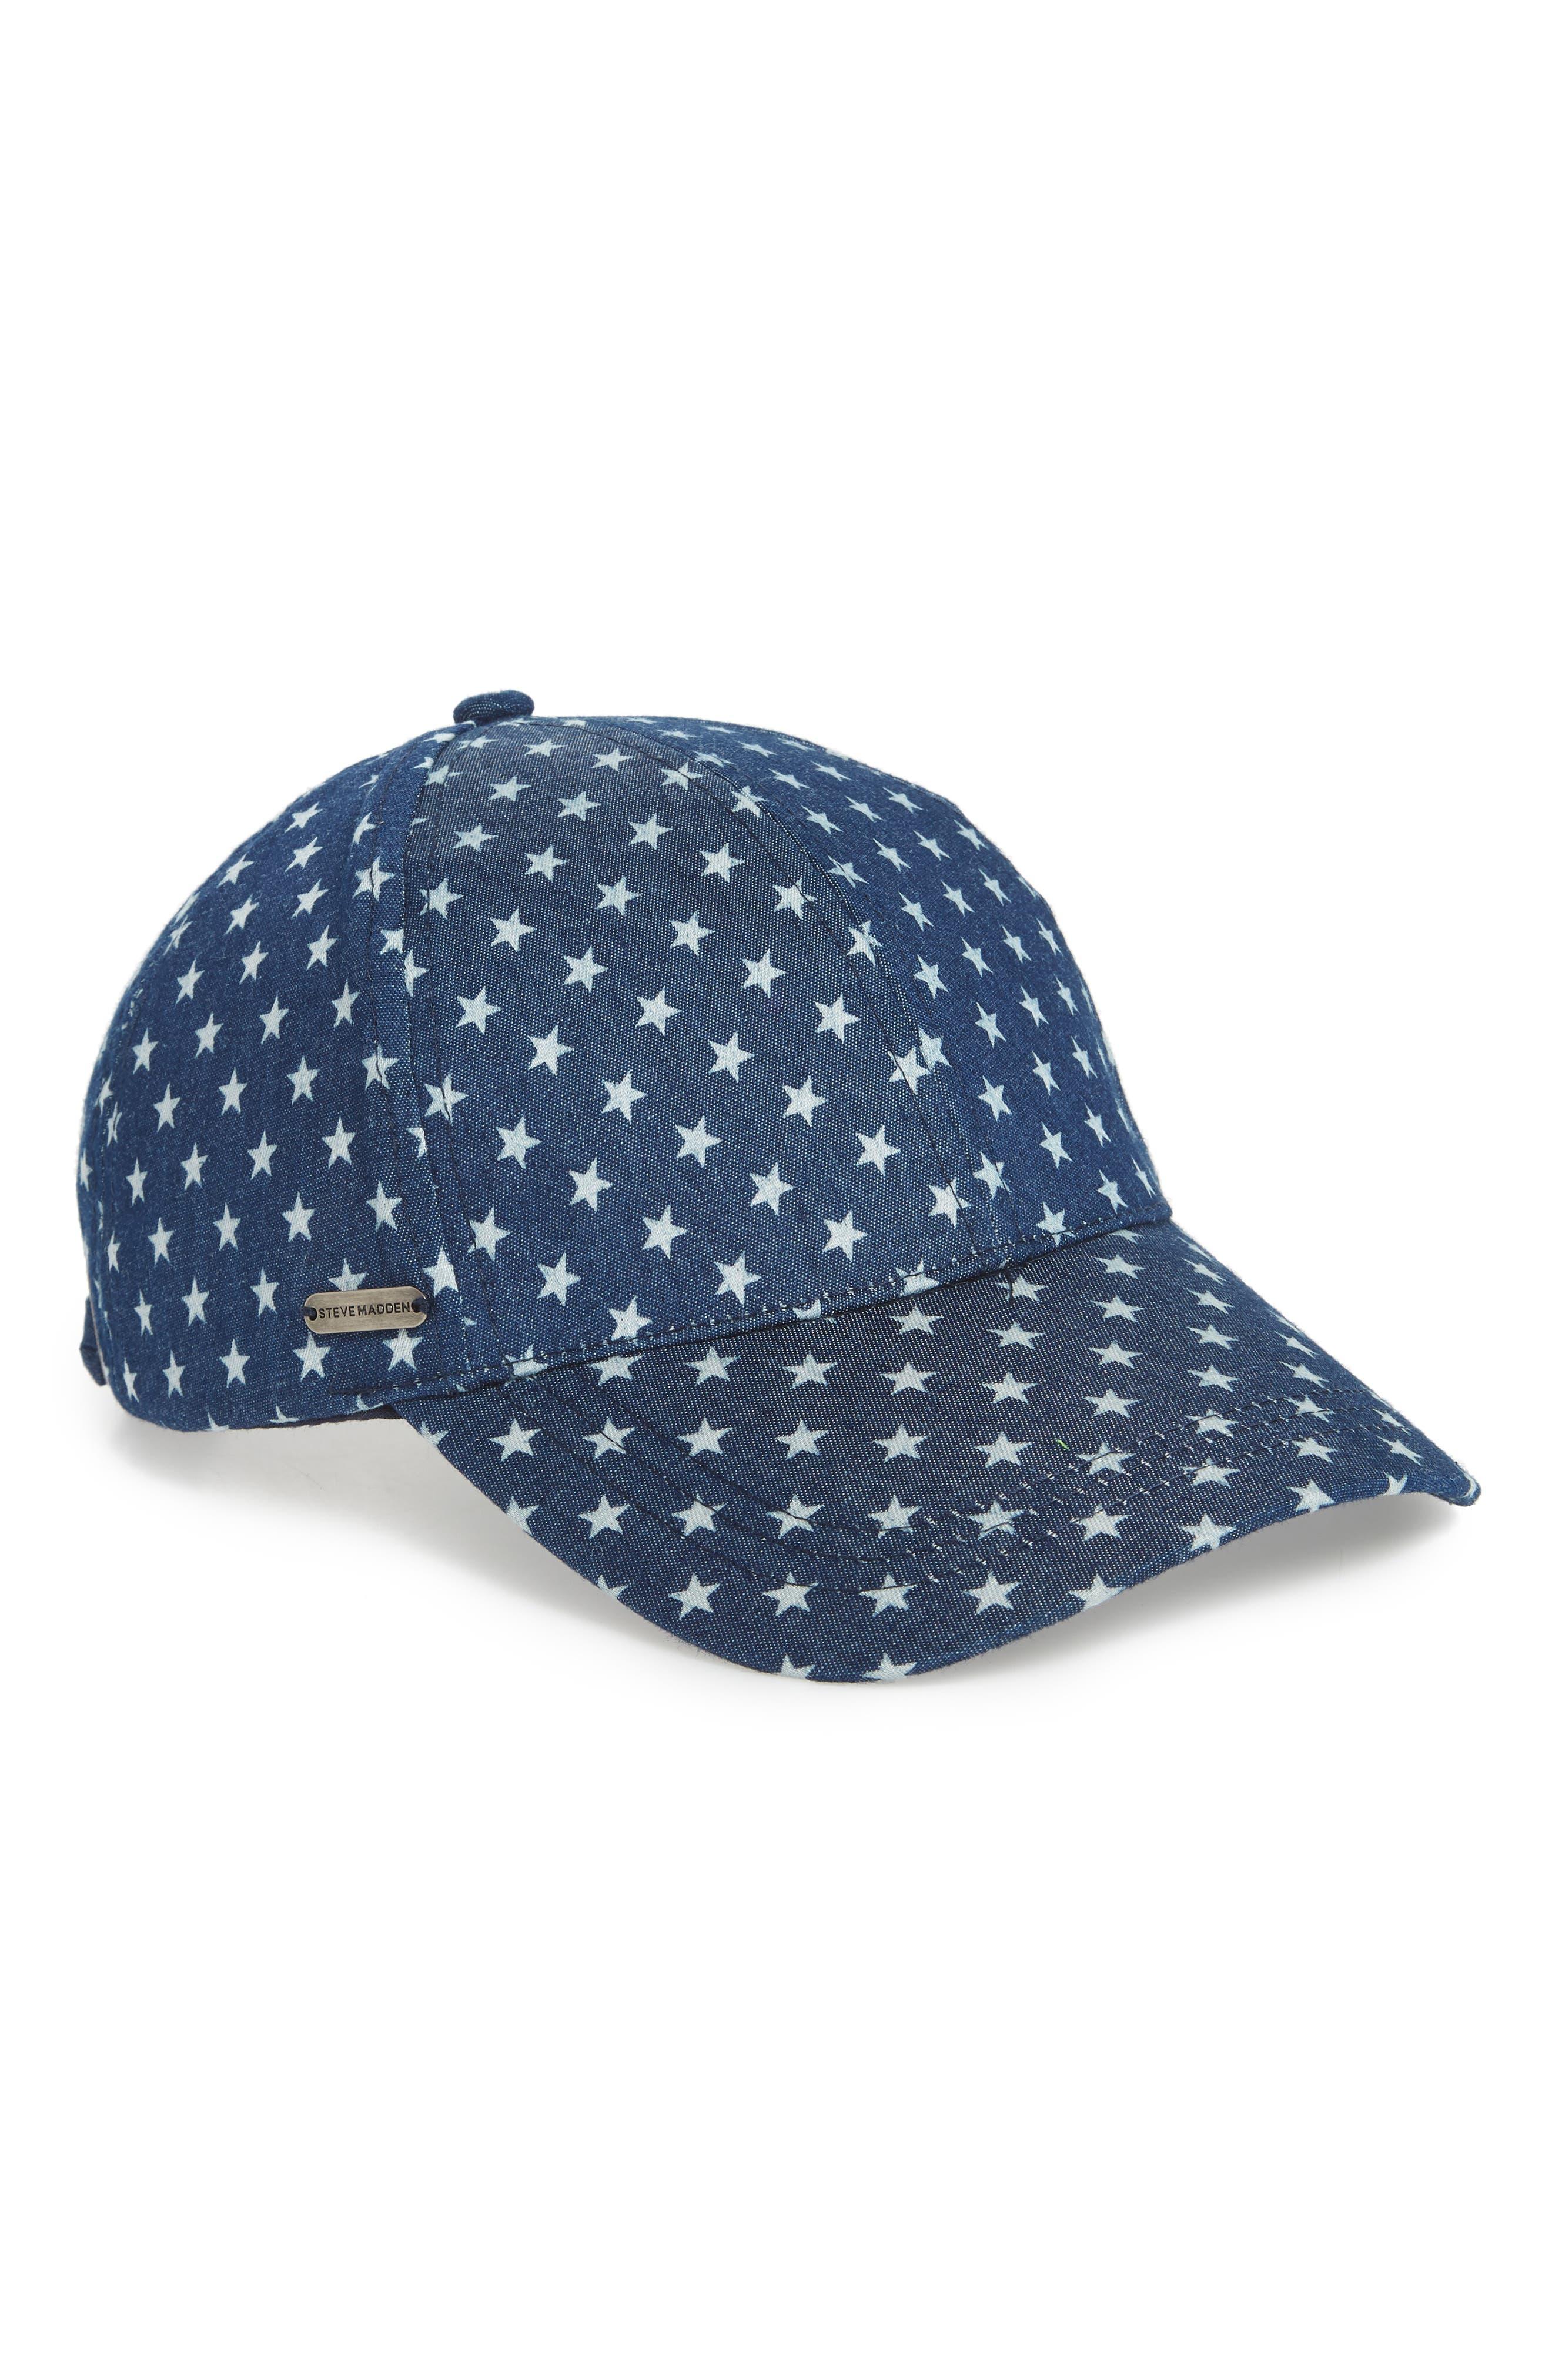 Lucky Stars Baseball Cap,                         Main,                         color, Dark Denim